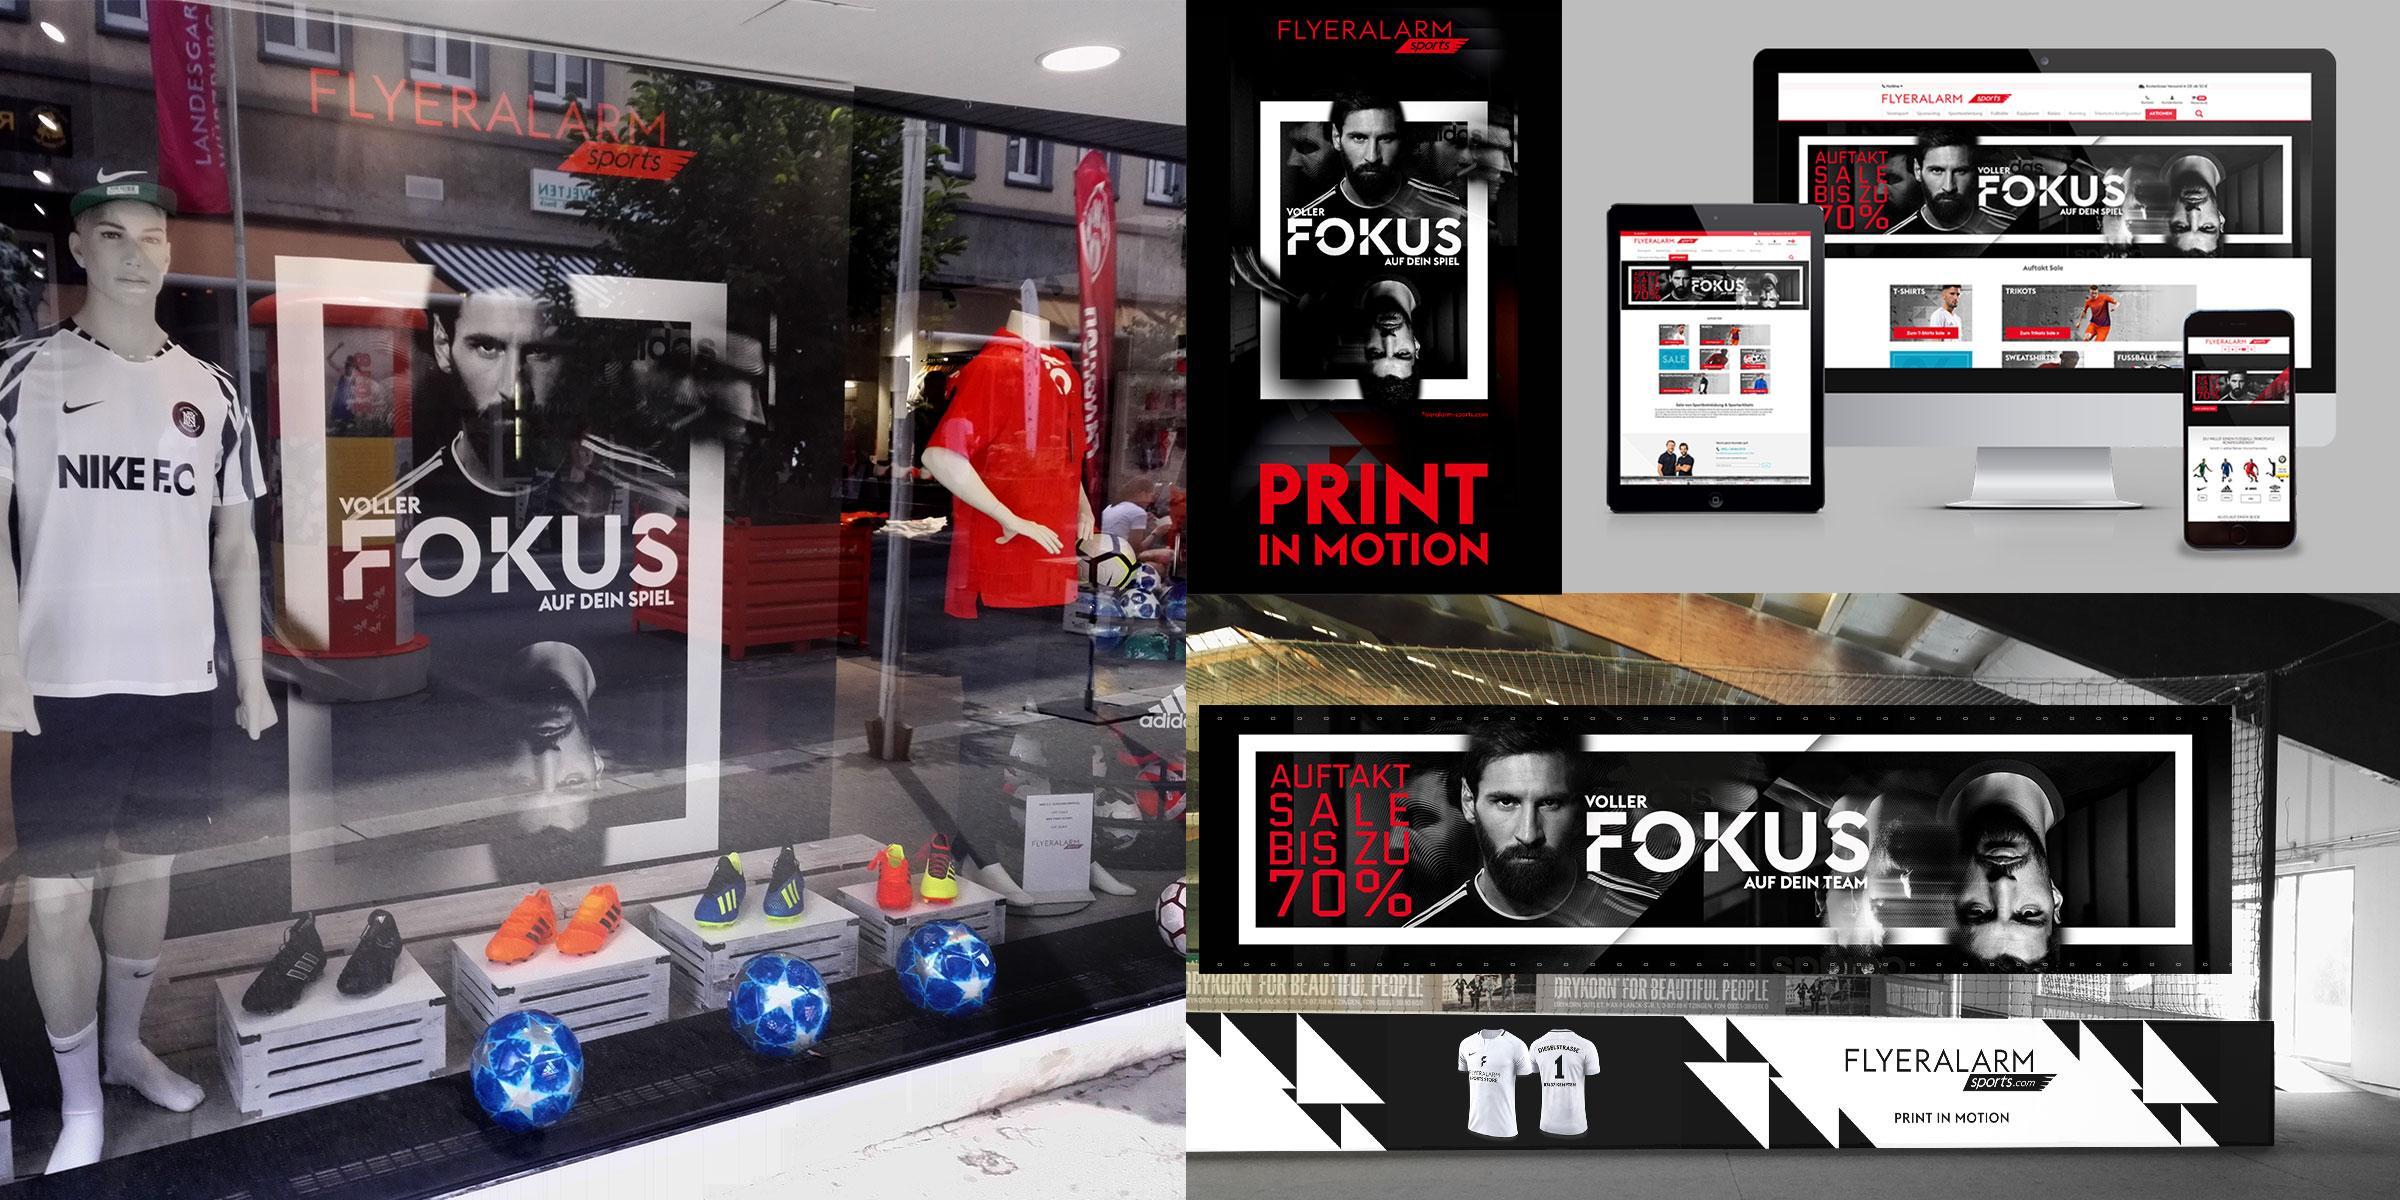 14 gfd gregor fenger designworks for fa sports de branding corporate design smm sma social media marketing online